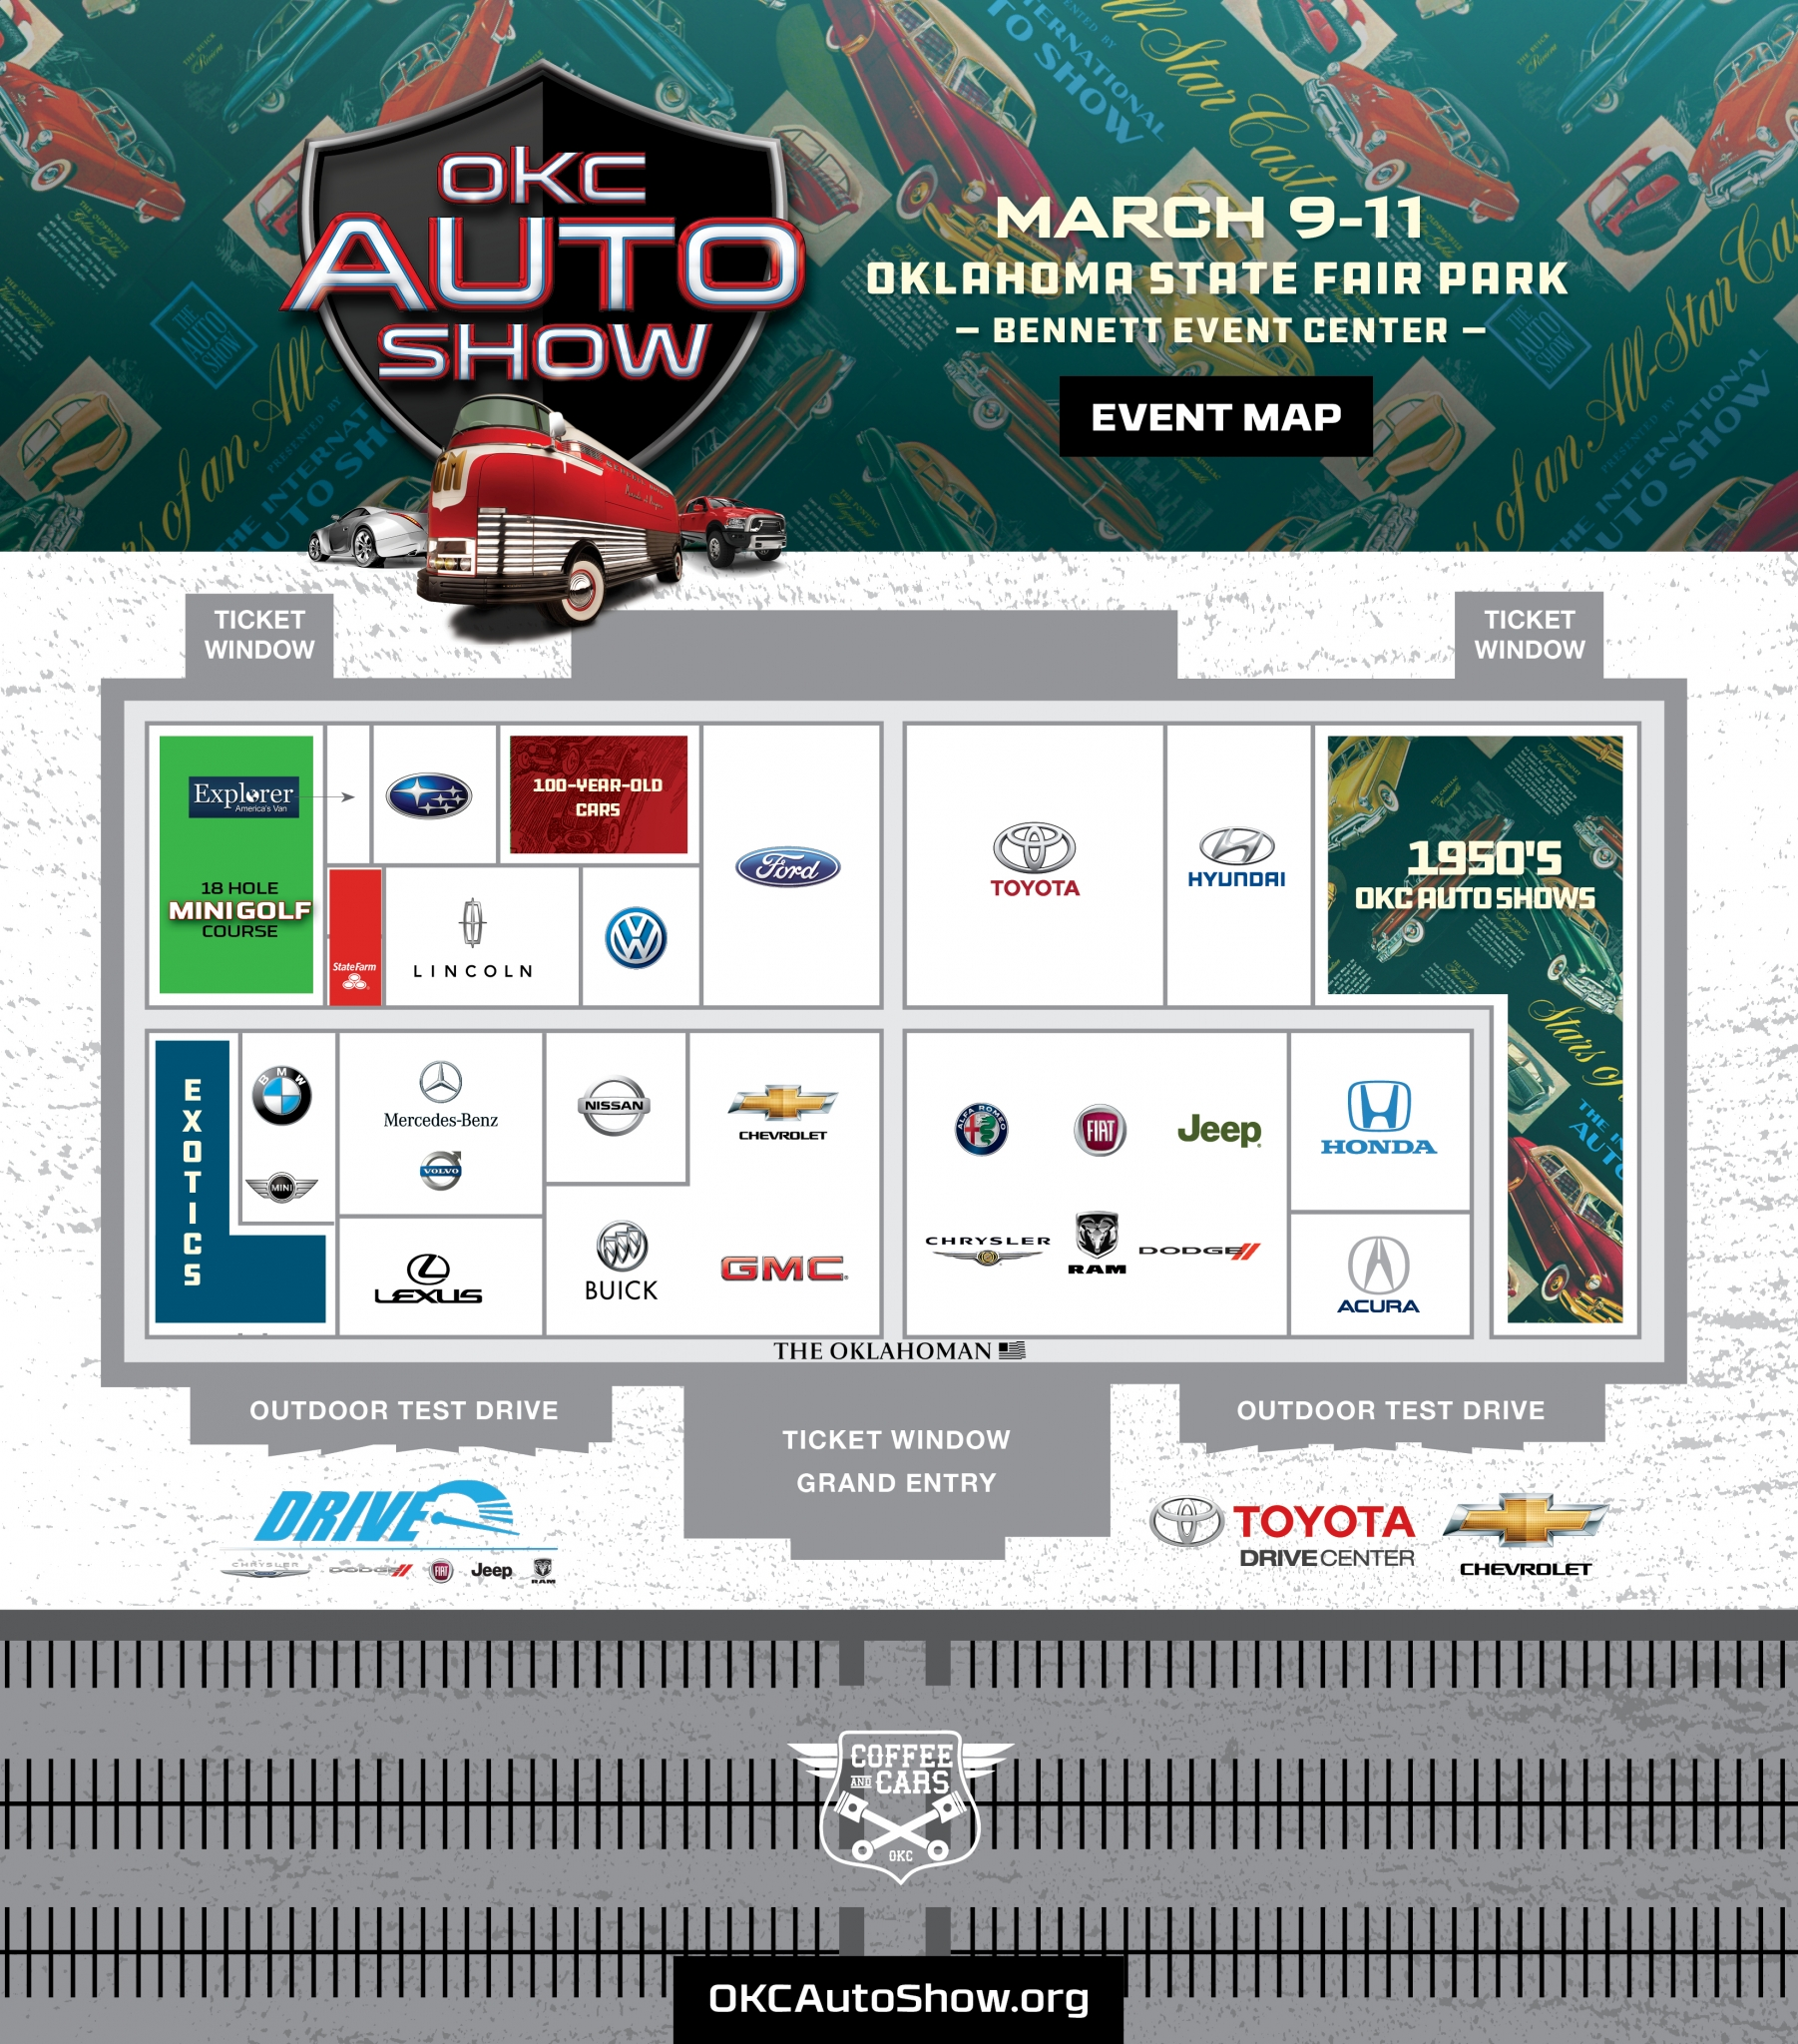 OKC-Auto-Show-Map